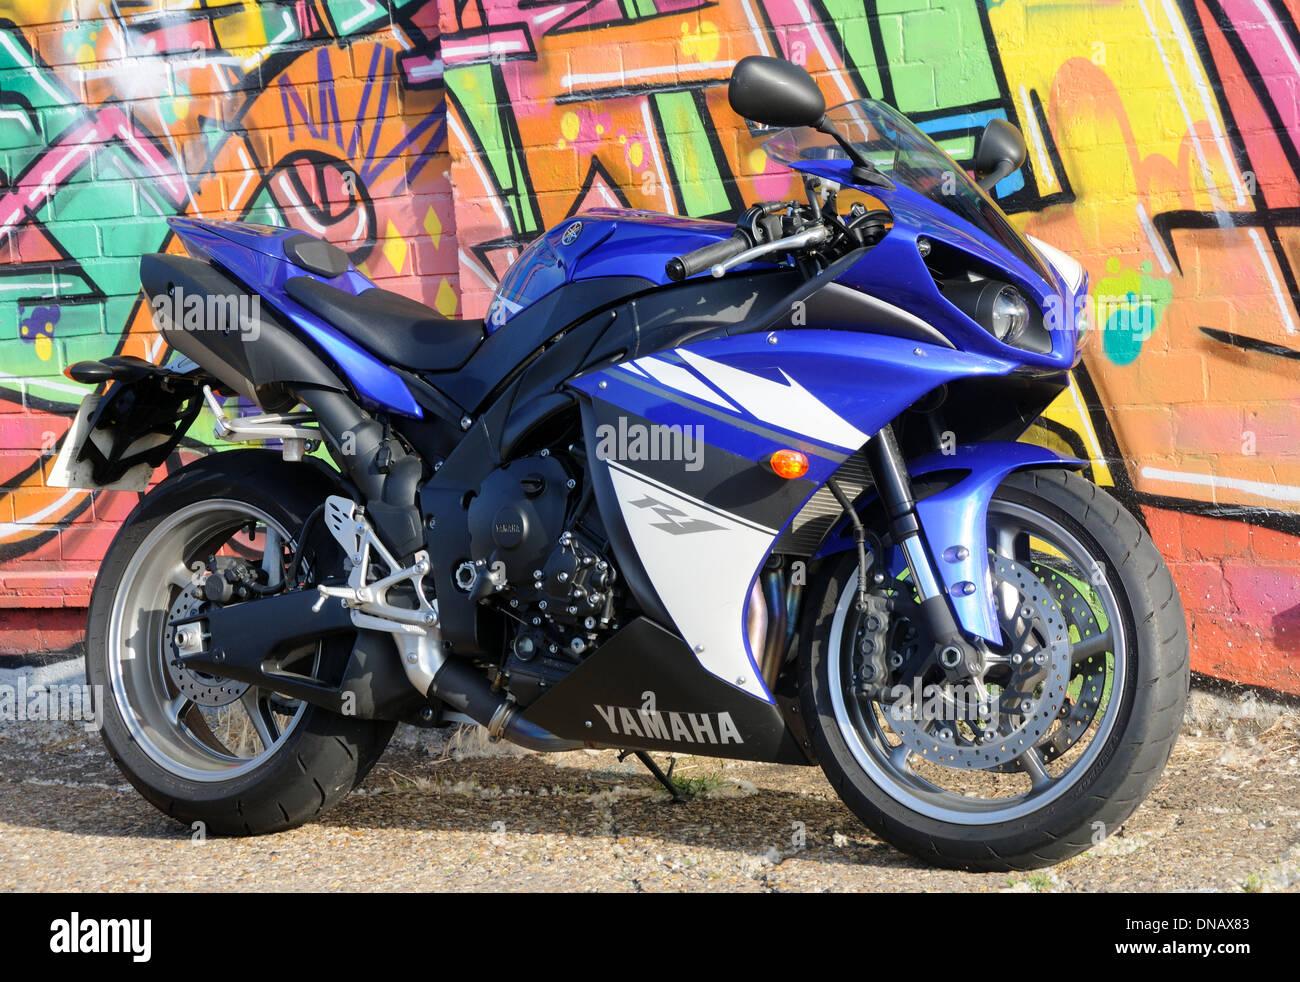 2009 Yamaha YZF-R1 motorcycle Stock Photo: 64779011 - Alamy